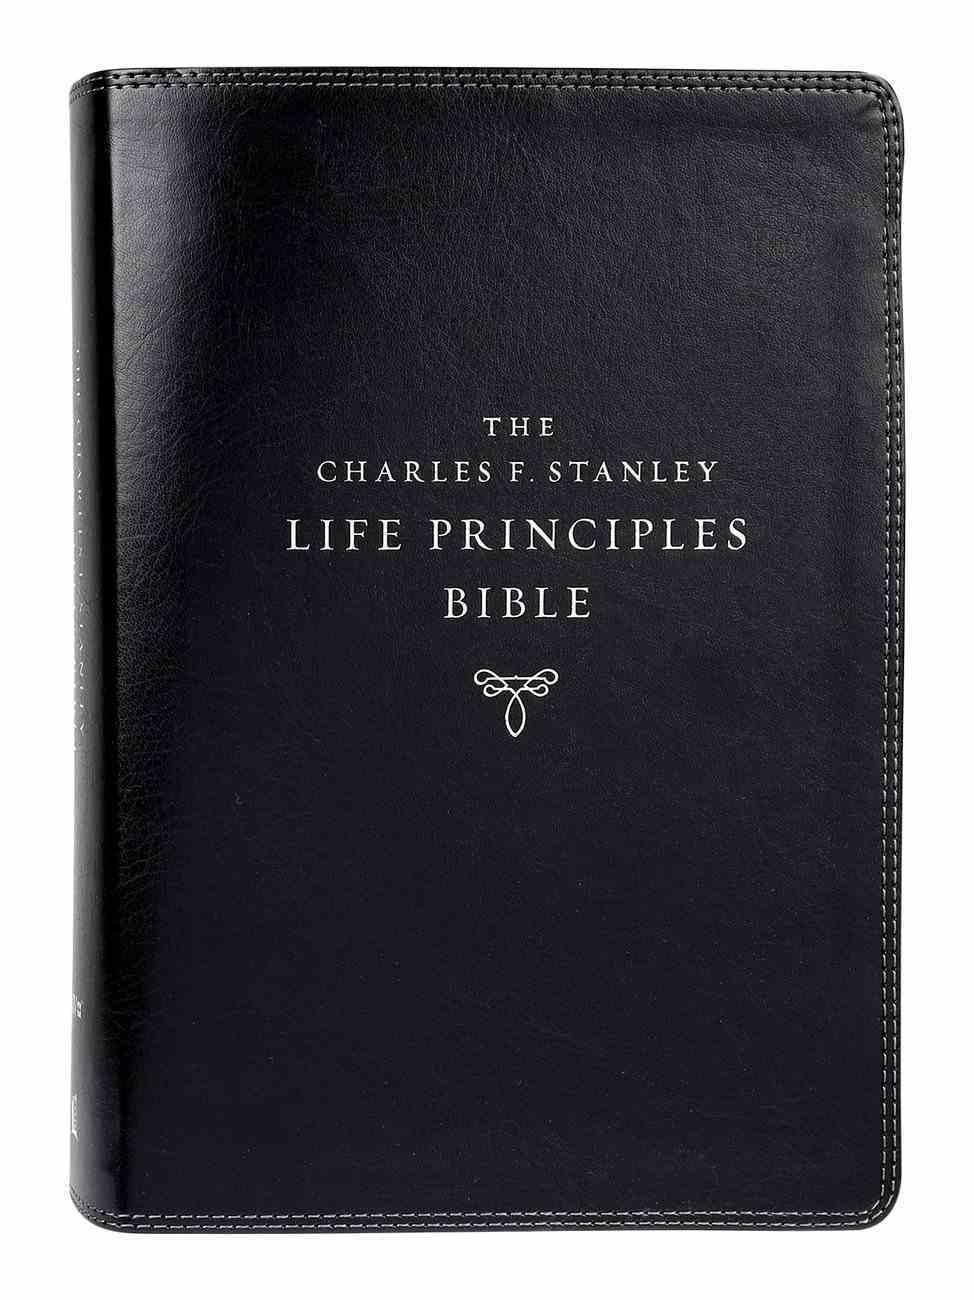 NIV Charles F Stanley Life Principles Bible Black (2nd Edition) Premium Imitation Leather